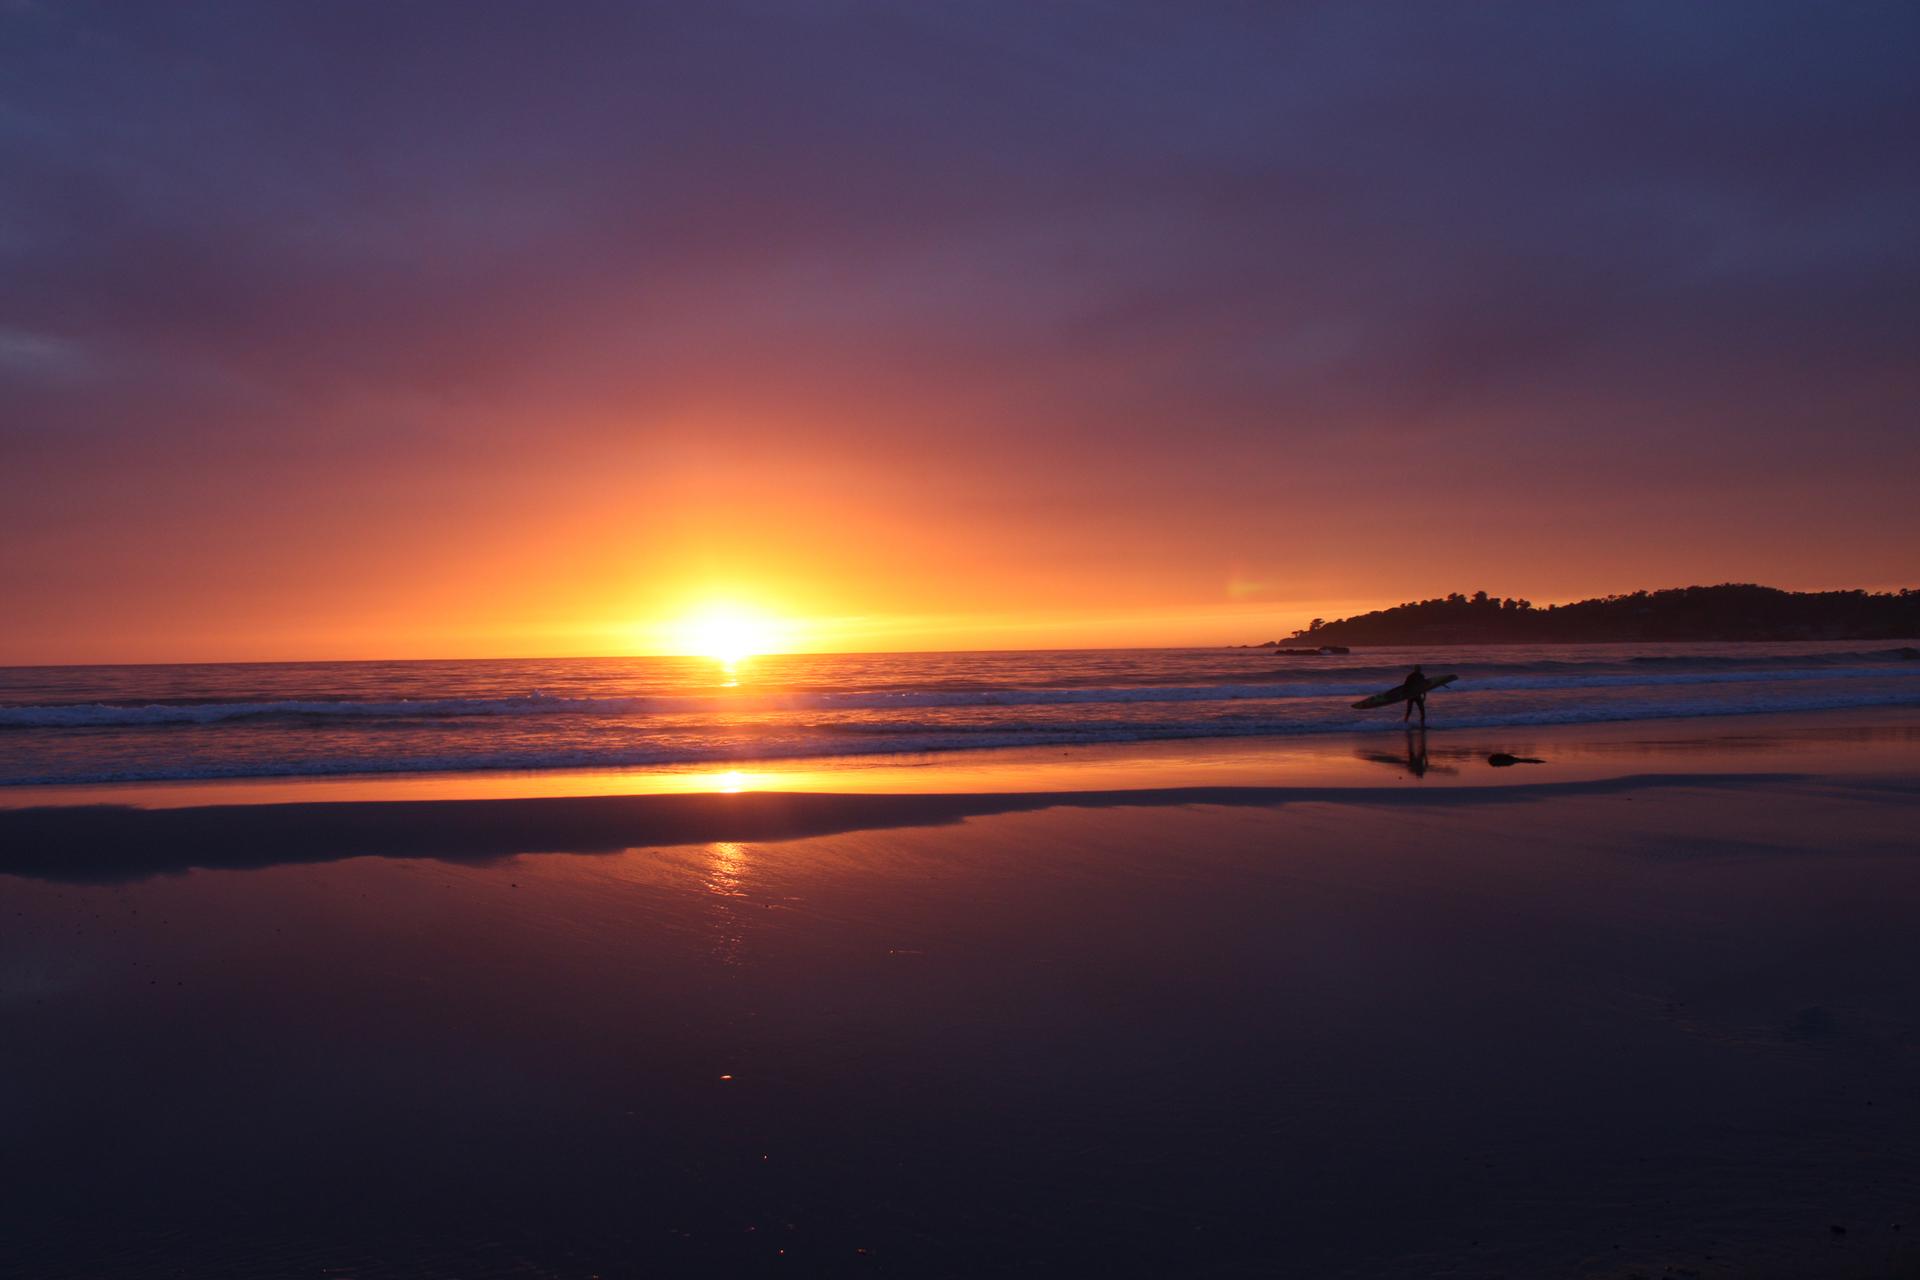 sunset   dawn, sun, water, evening